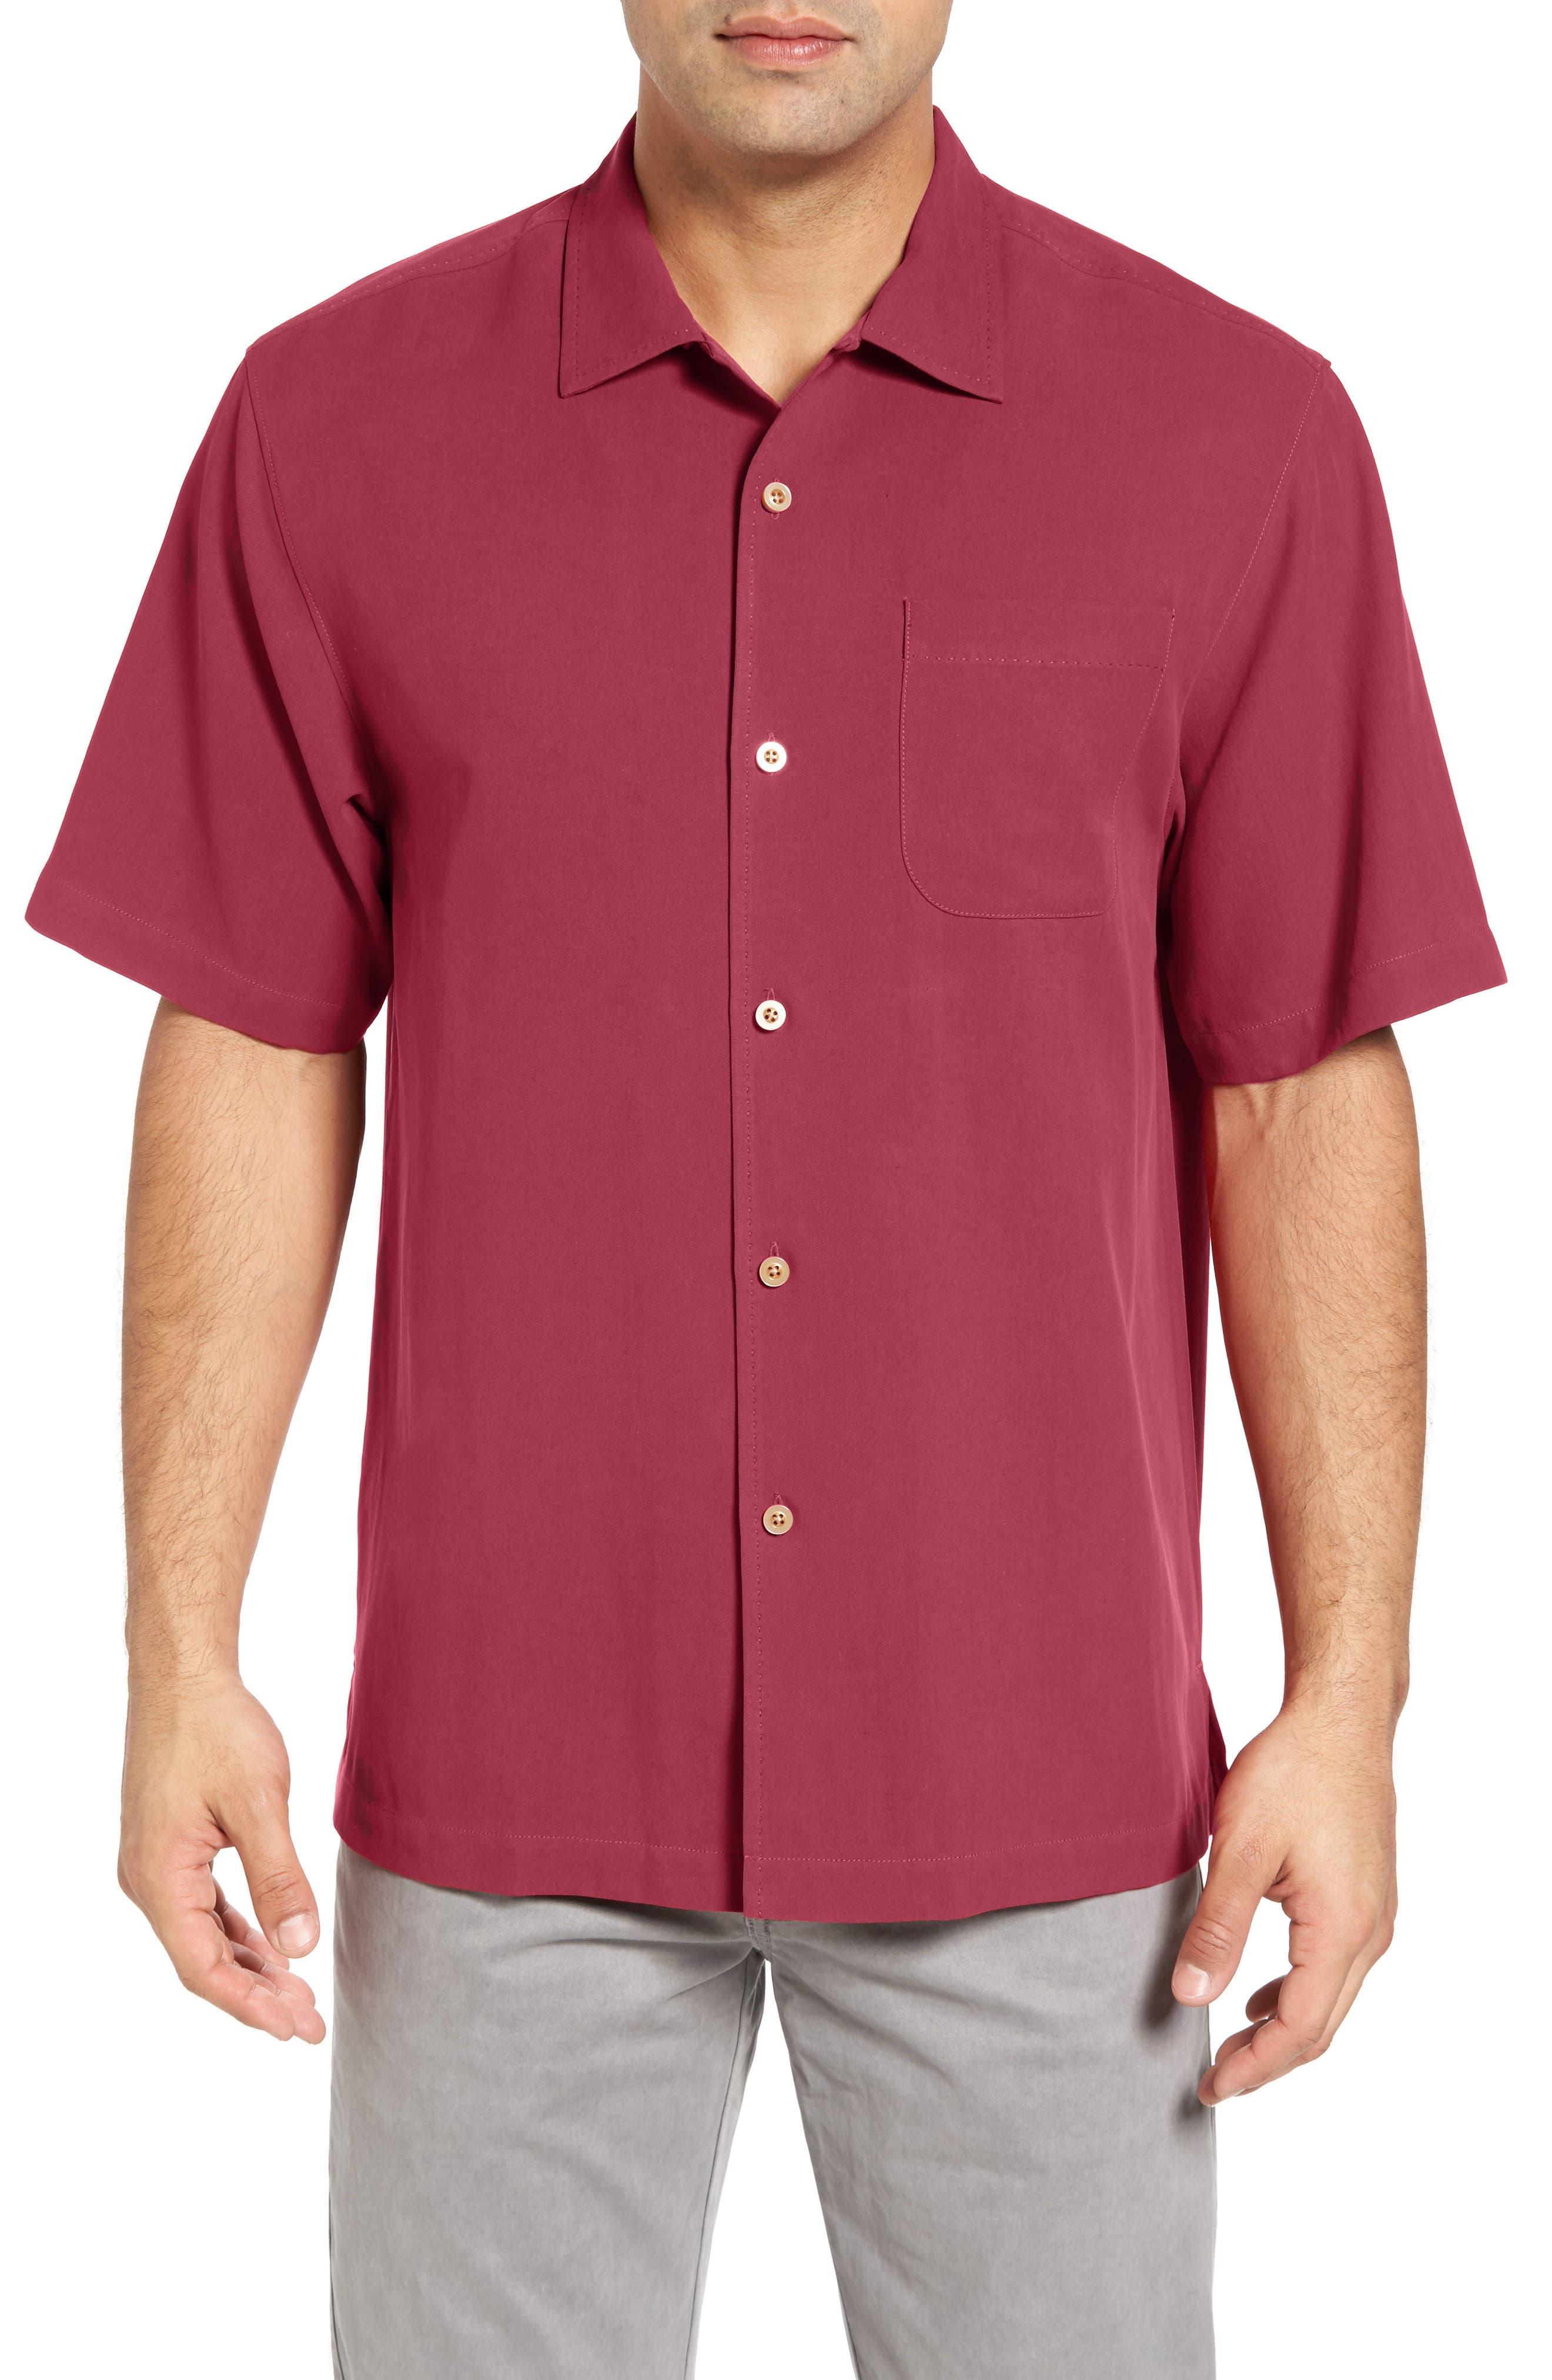 Alternate Image 1 Selected - Tommy Bahama Catalina Twill Short Sleeve Silk Camp Shirt